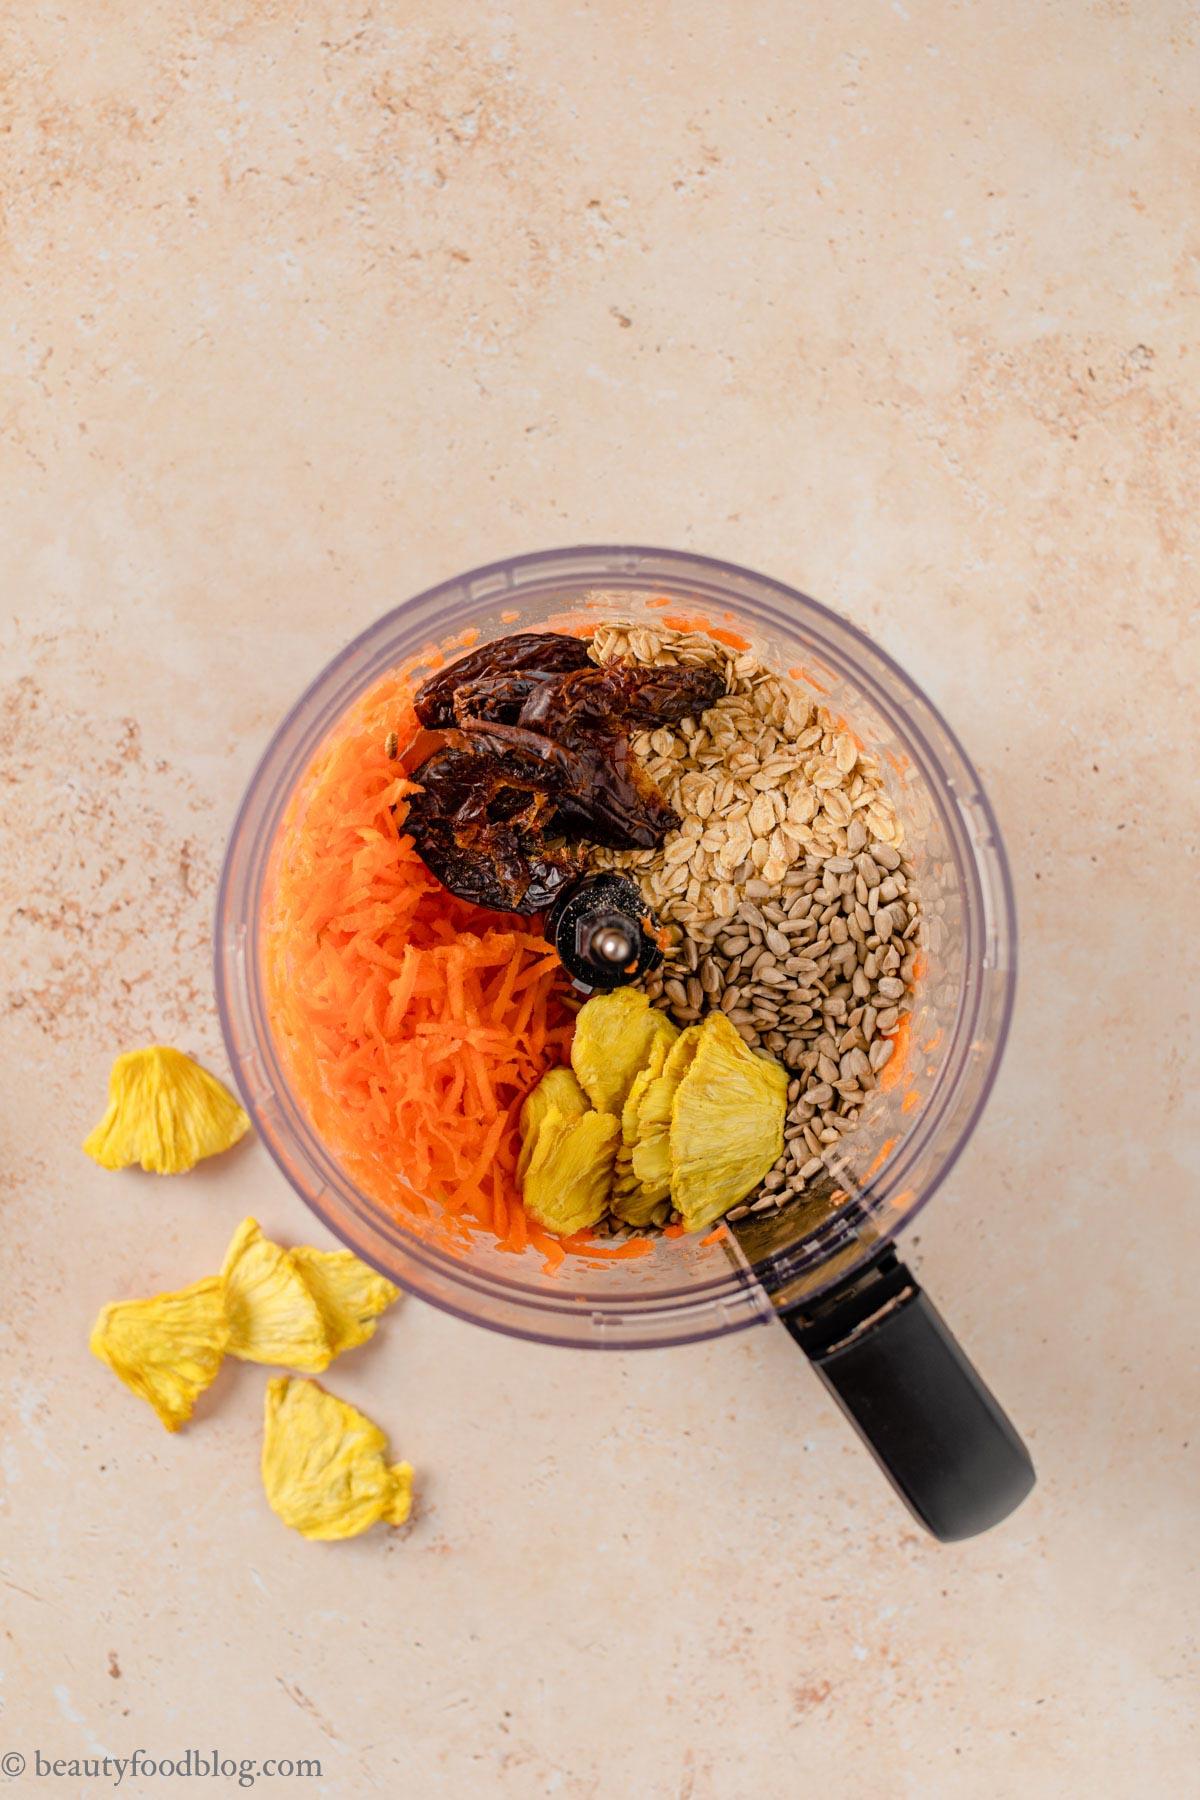 ricetta energy balls alle carote senza frutta secca senza zuccheri aggiunti no-bake nut-free vegan carrot cake bites recipe